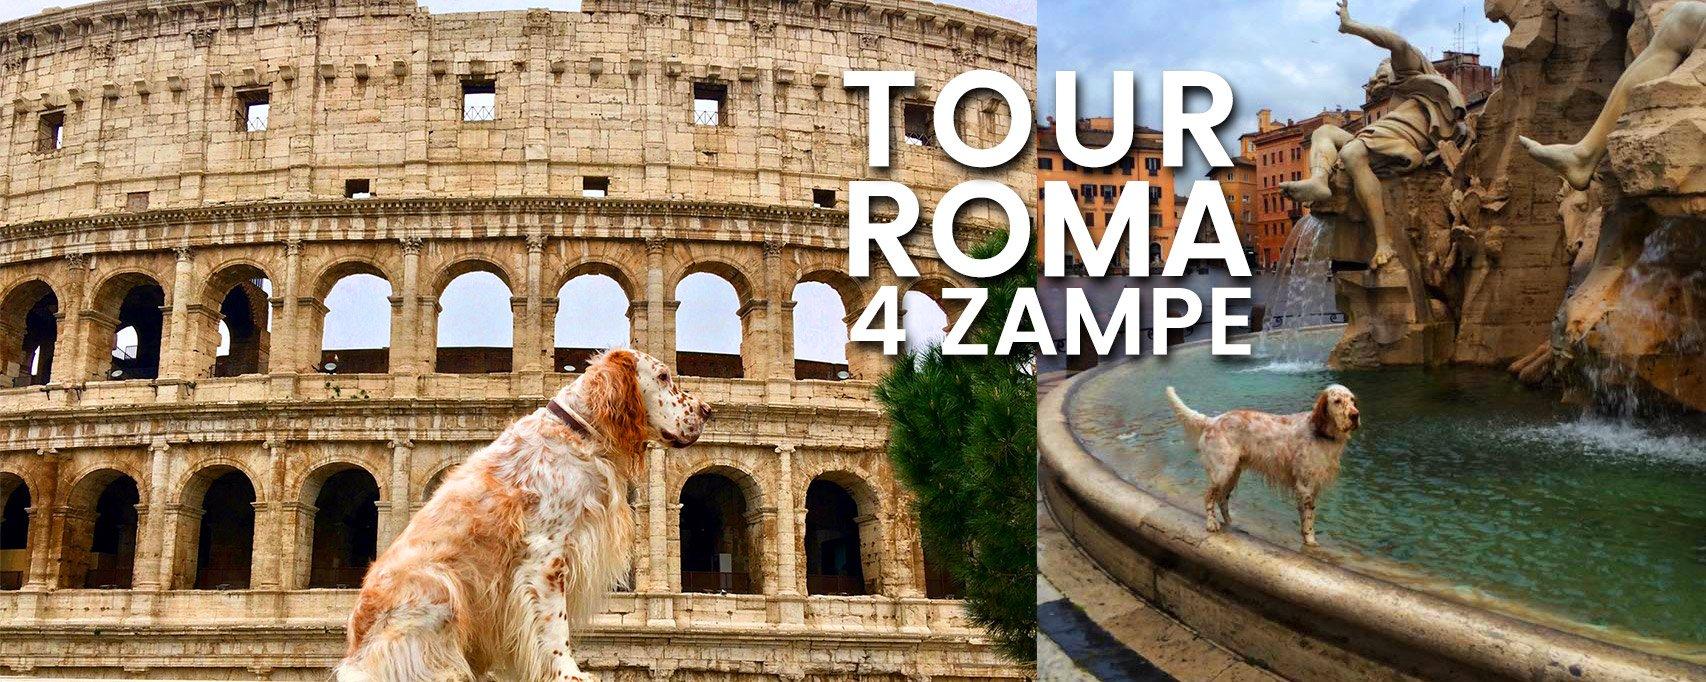 tour roma 4 zampe